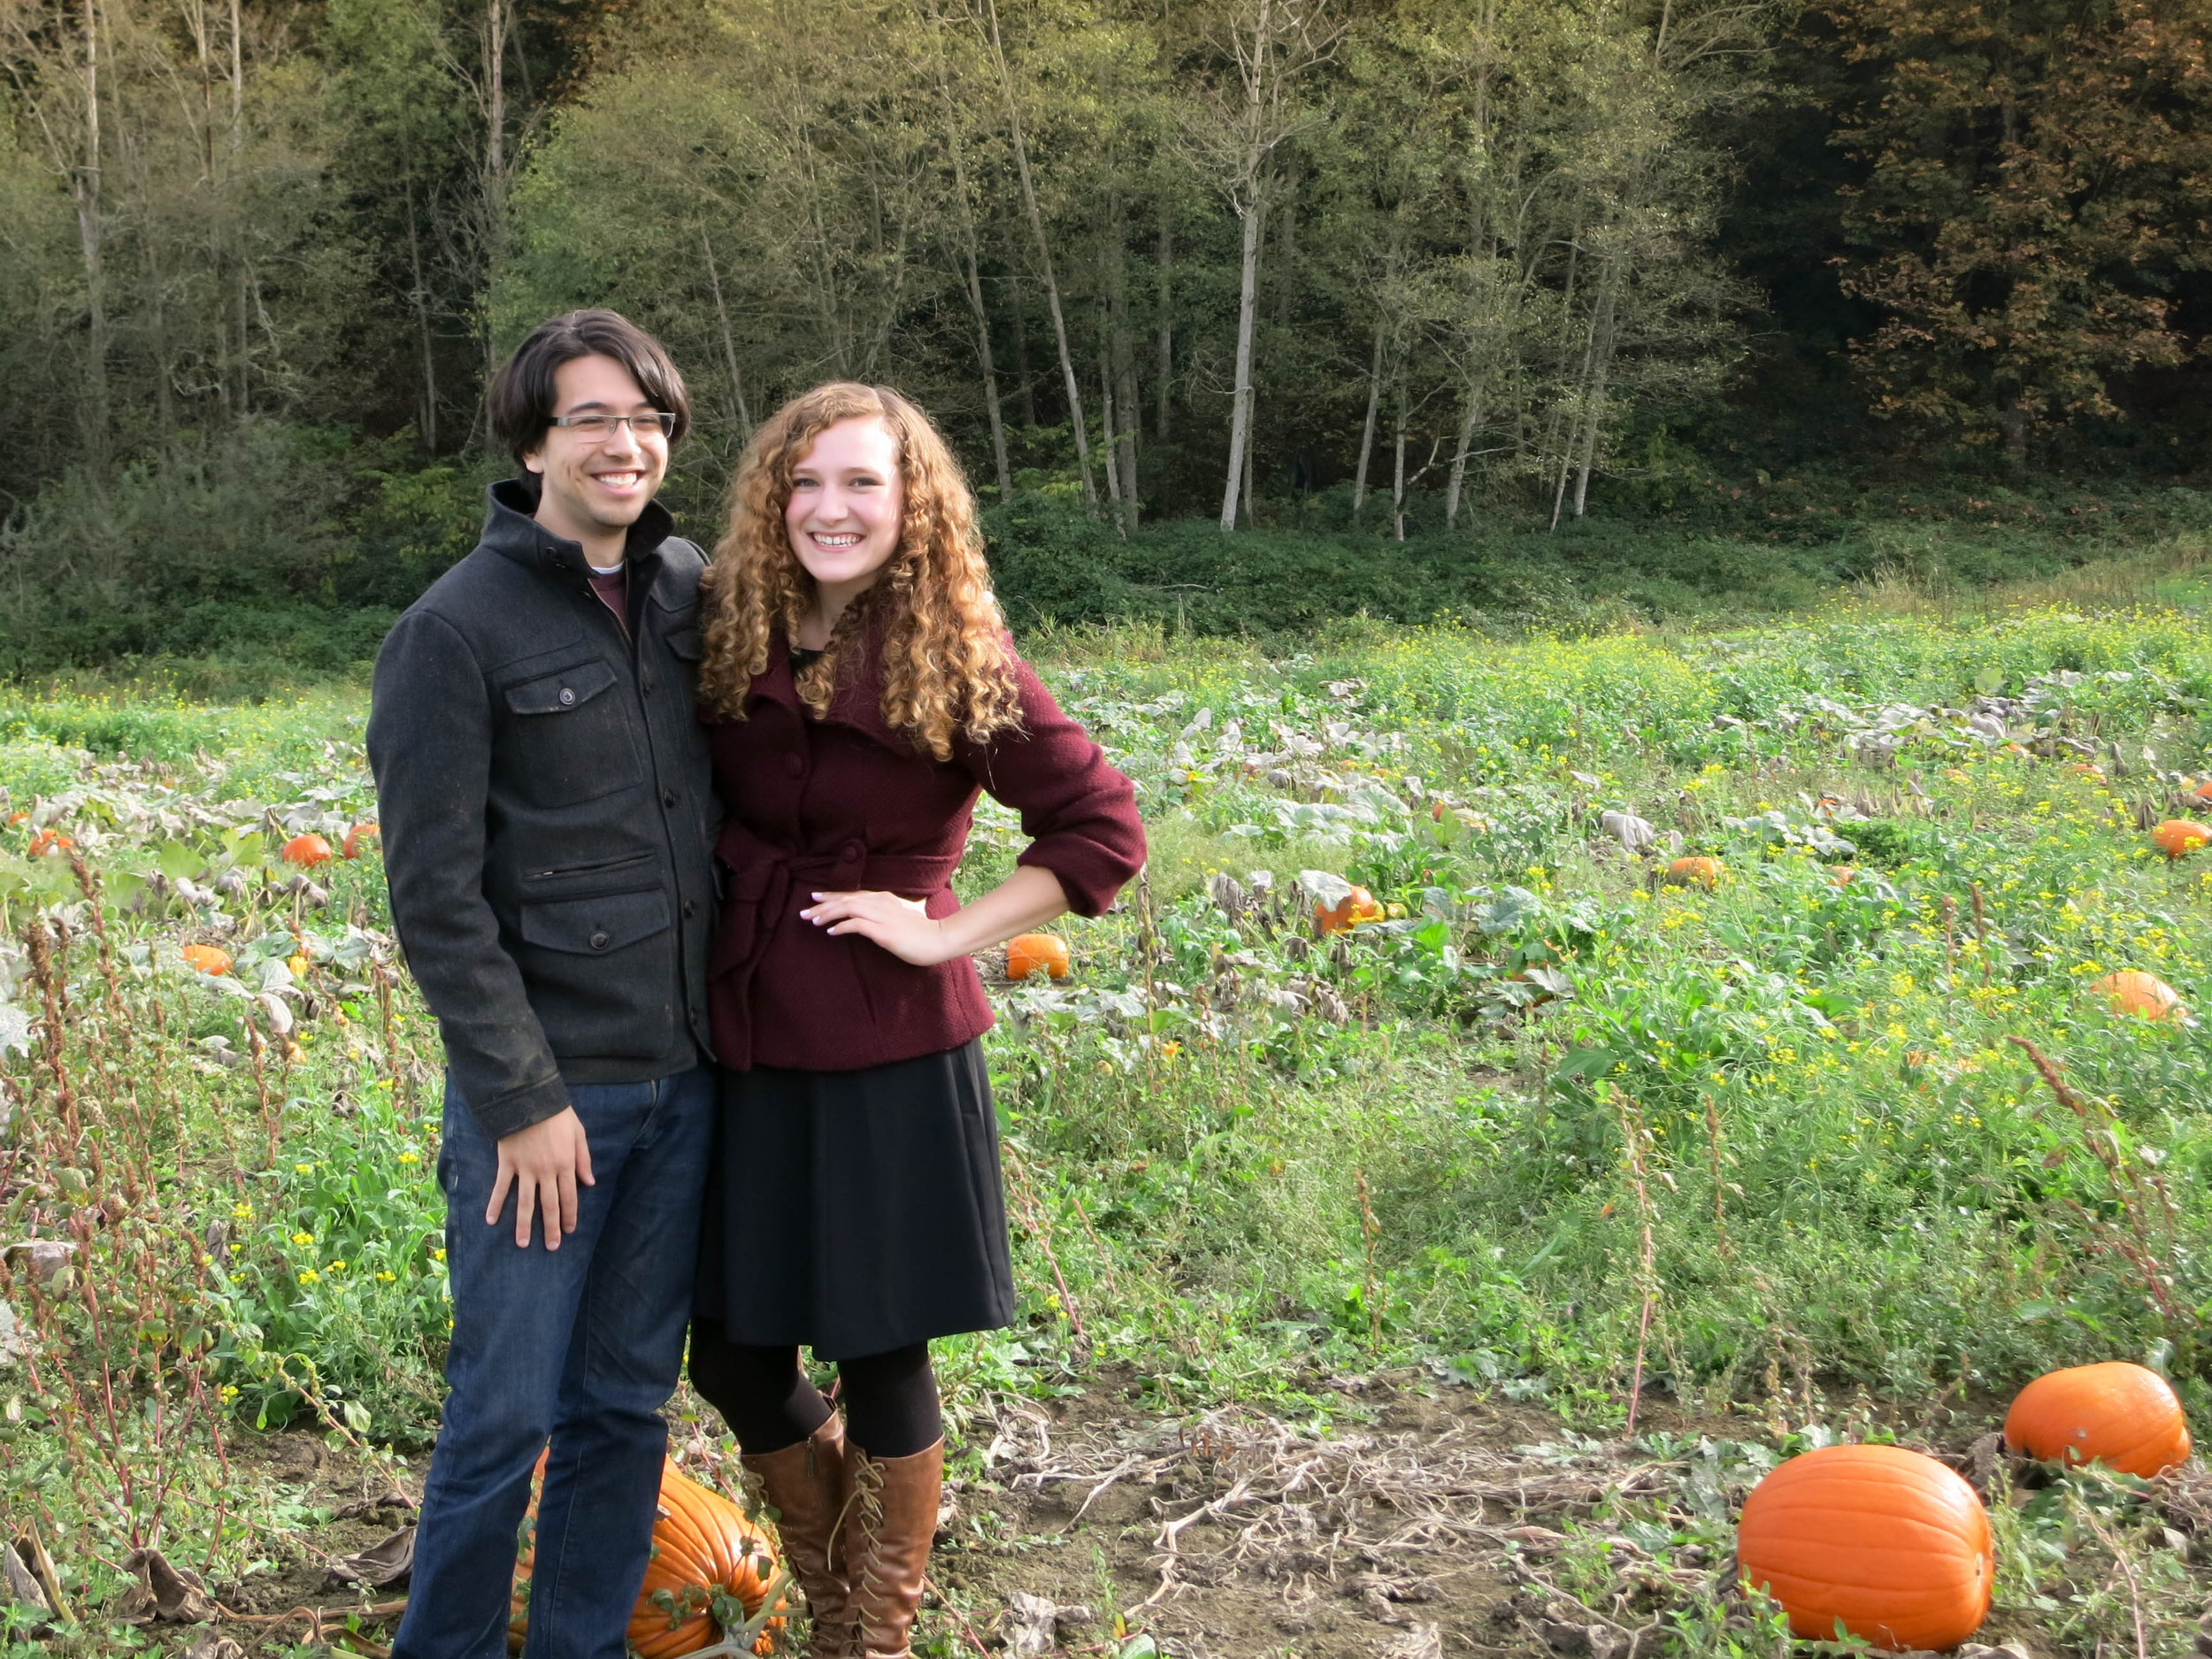 Pumpkin patch this fall.